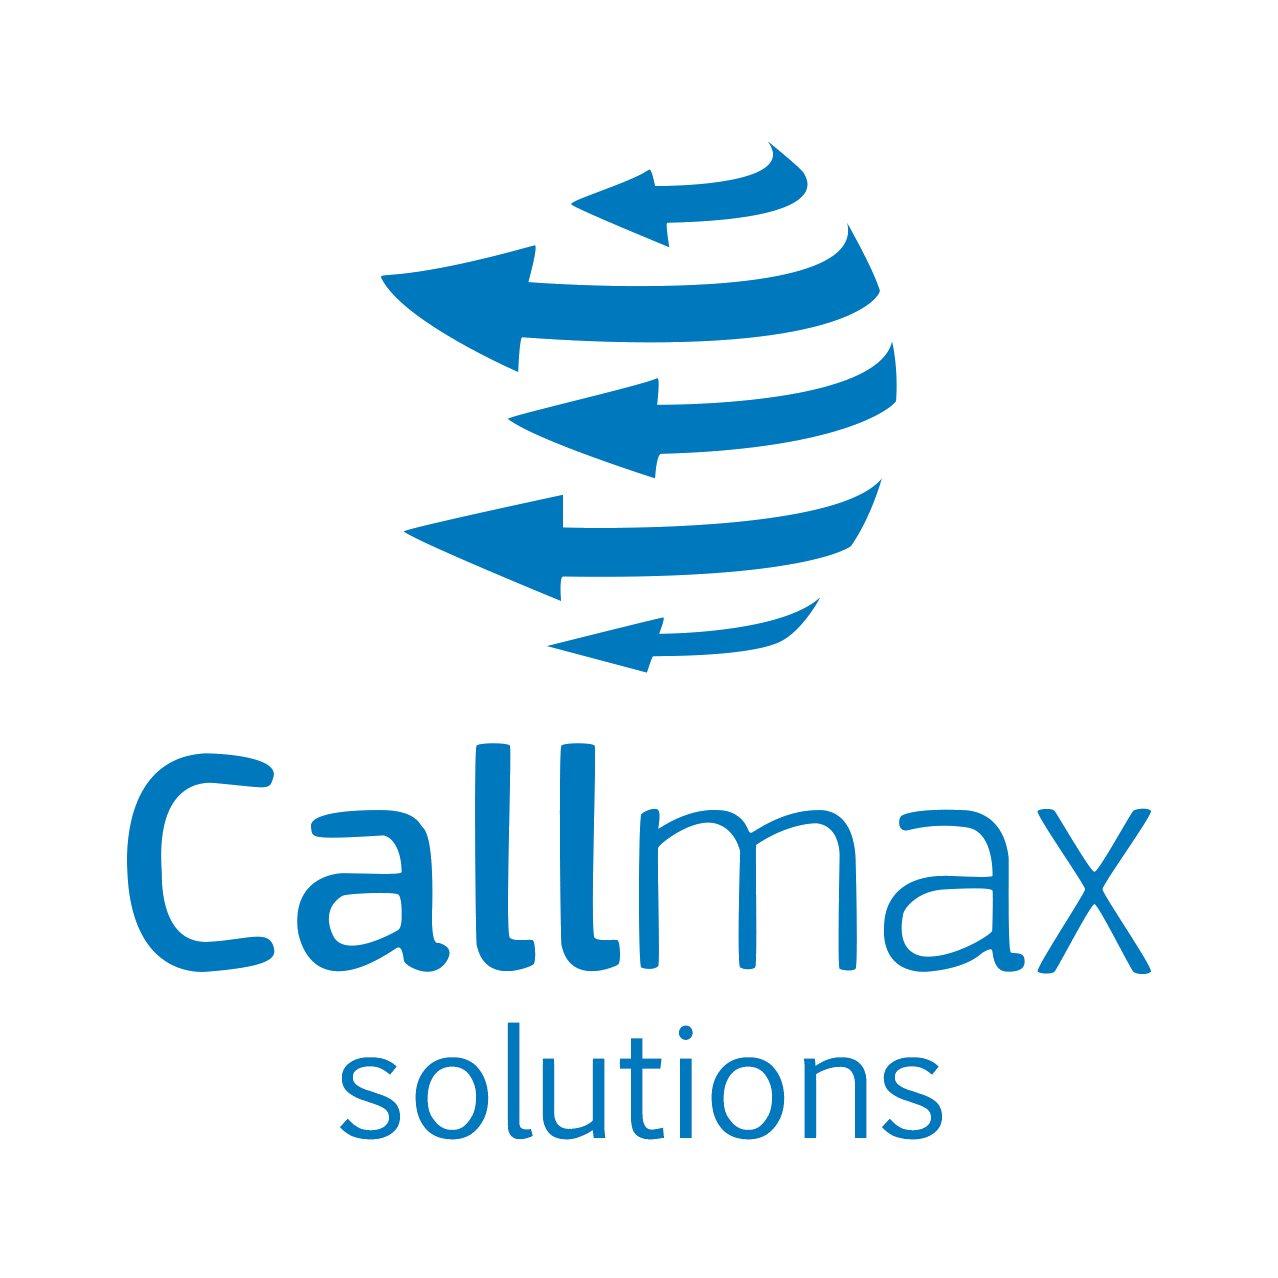 CallMax Solutions